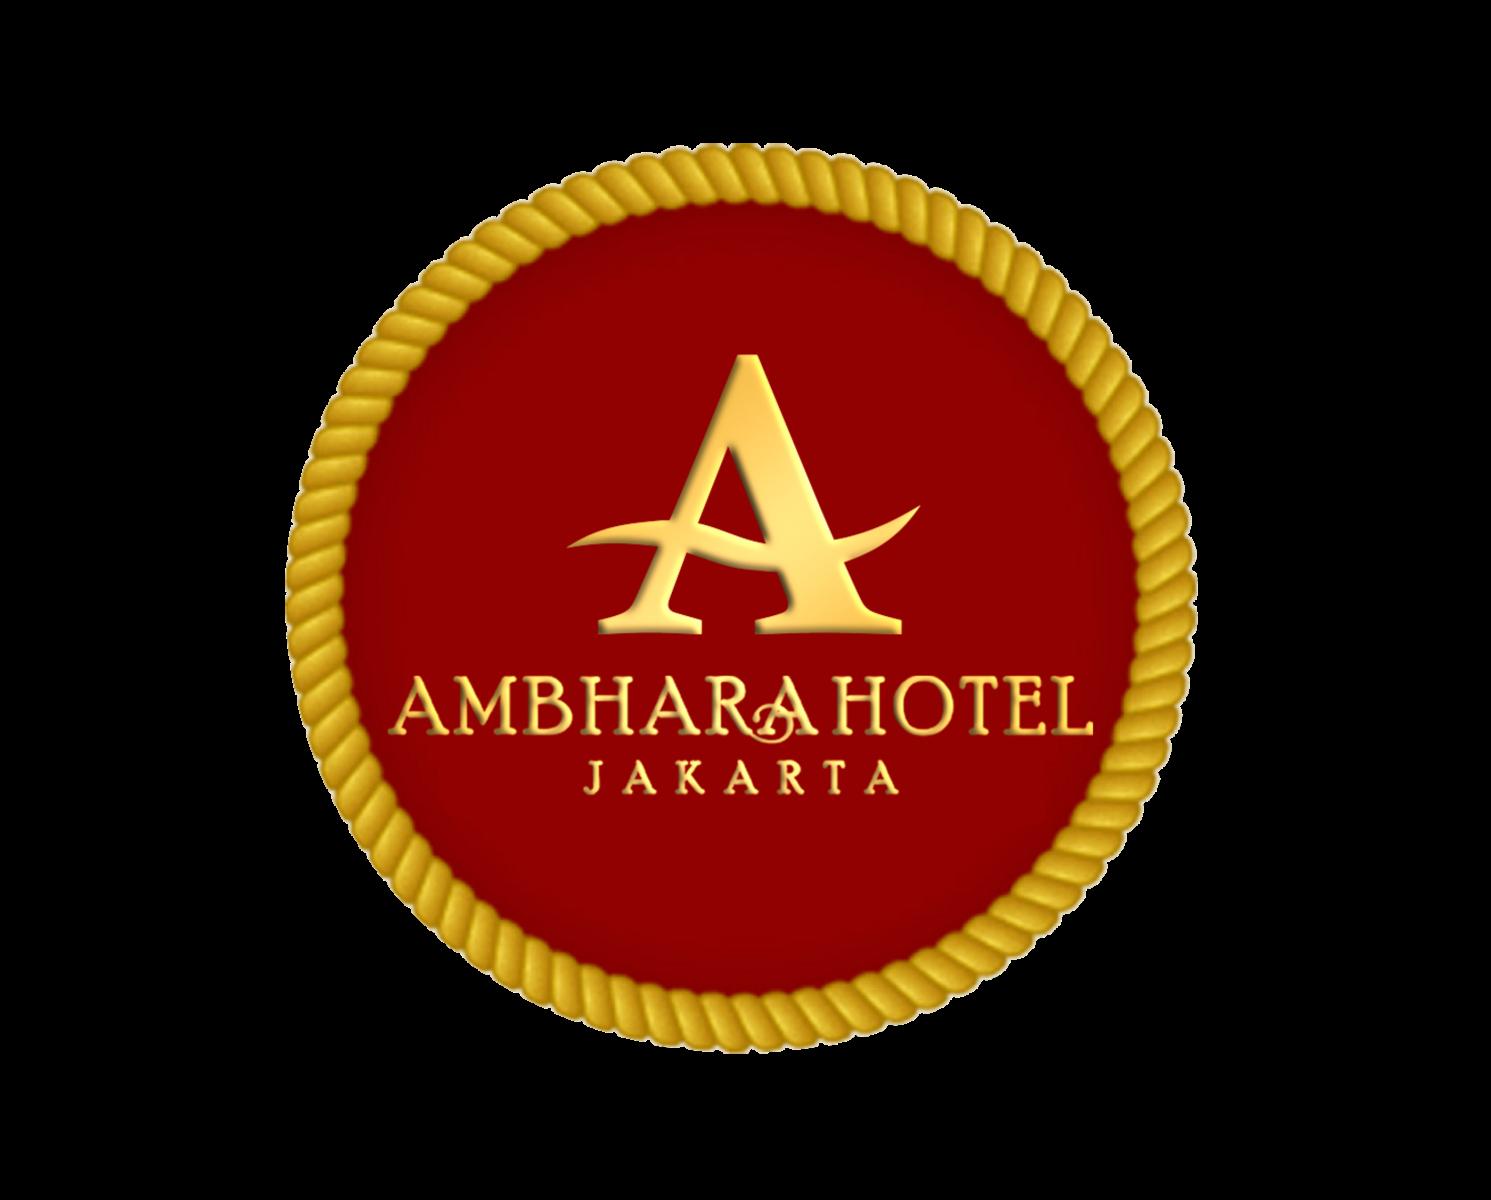 Ambhara Hotel Jakarta, 4 Star Business Hotel in Jakarta